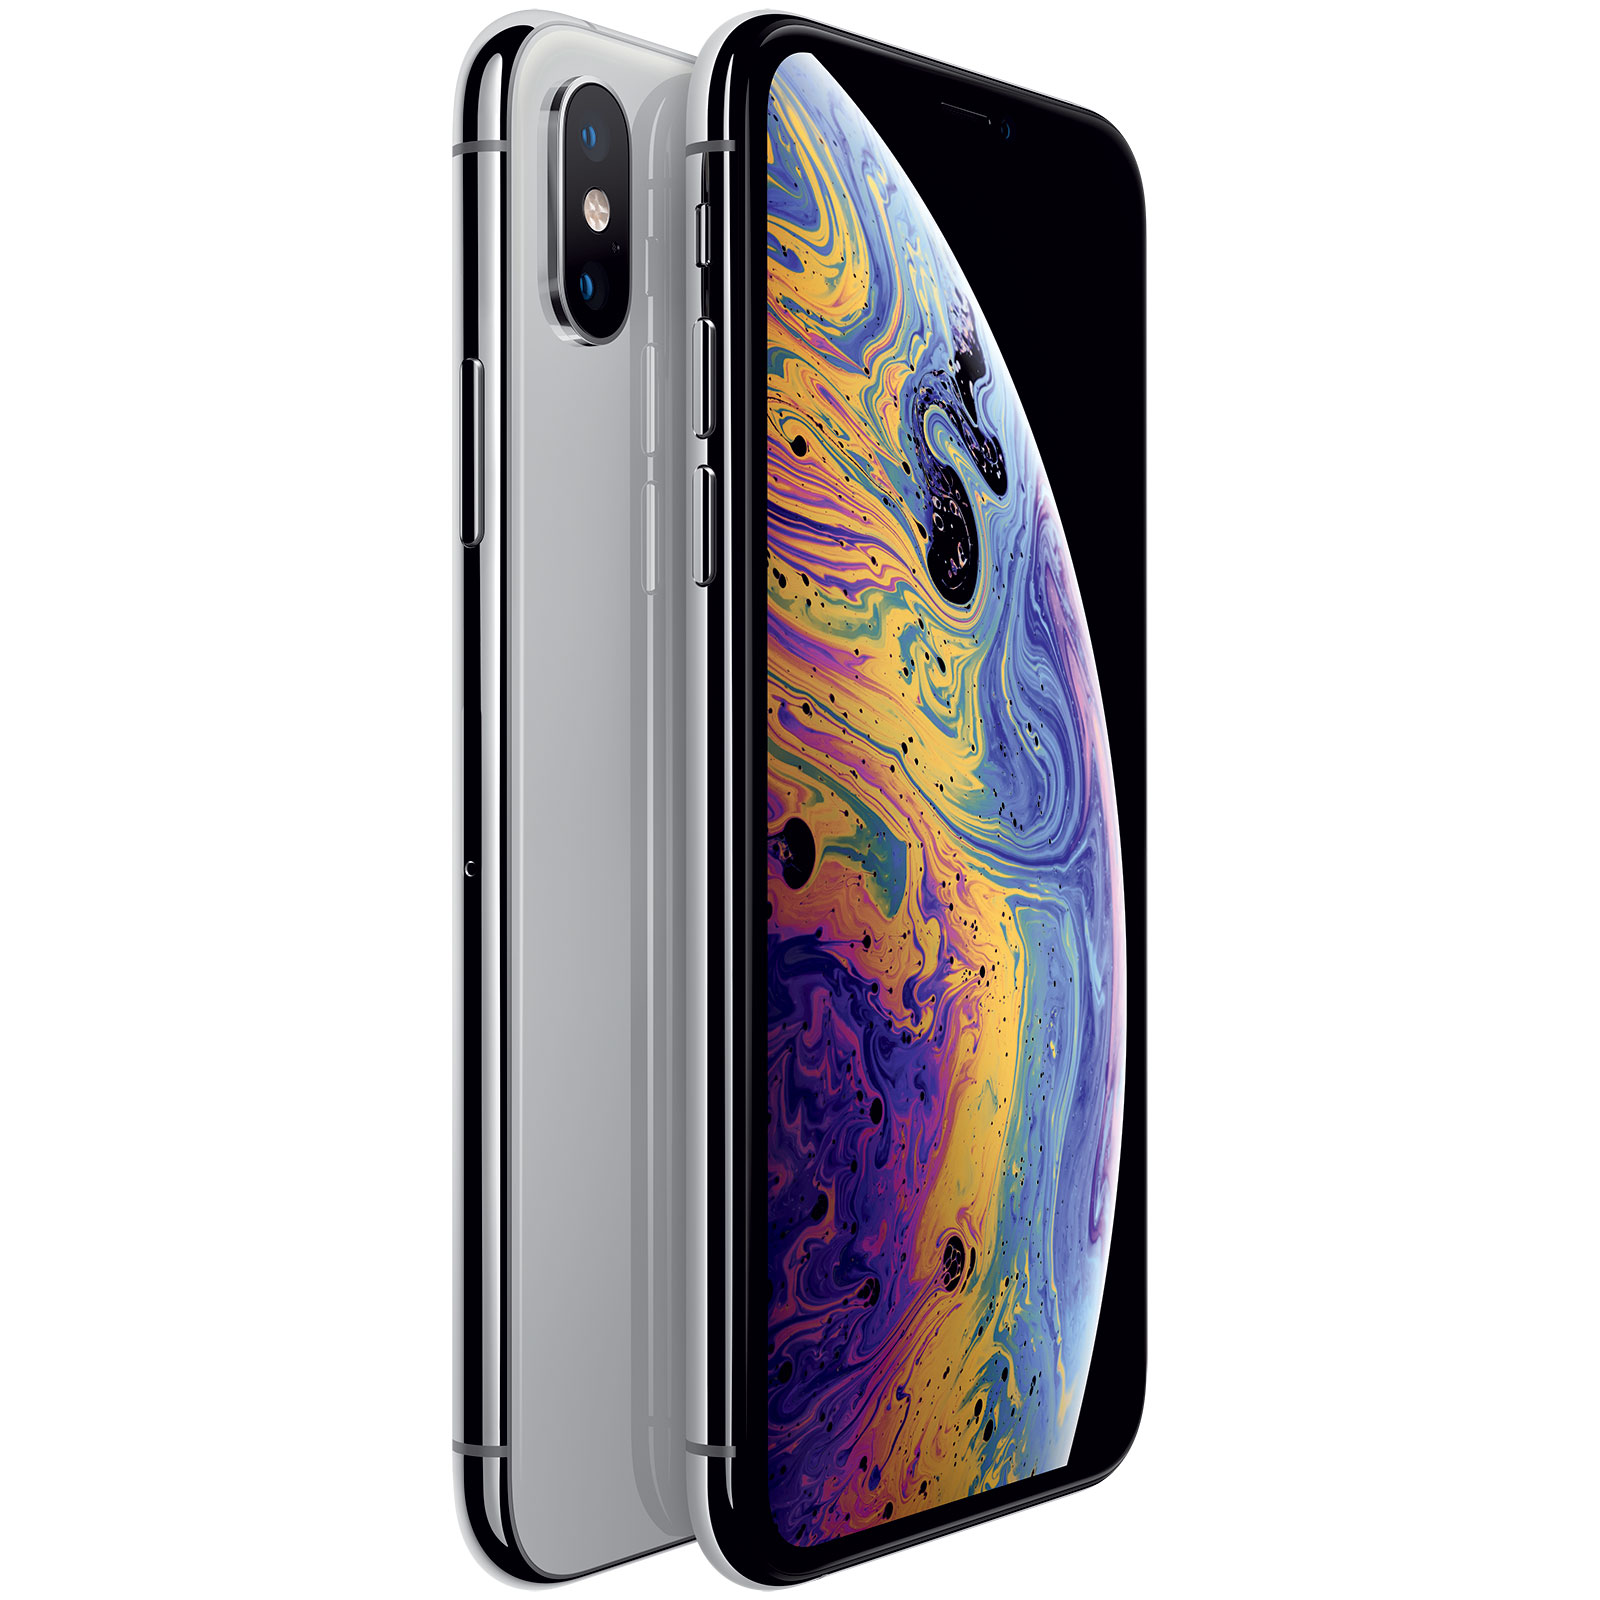 "Mobile & smartphone Apple iPhone Xs 64 Go Argent Smartphone 4G-LTE Advanced IP68 Dual SIM - Apple A12 Bionic Hexa-Core - RAM 4 Go - Ecran Super Retina 5.8"" 1125 x 2436 - 64 Go - NFC/Bluetooth 5.0 - iOS 12"